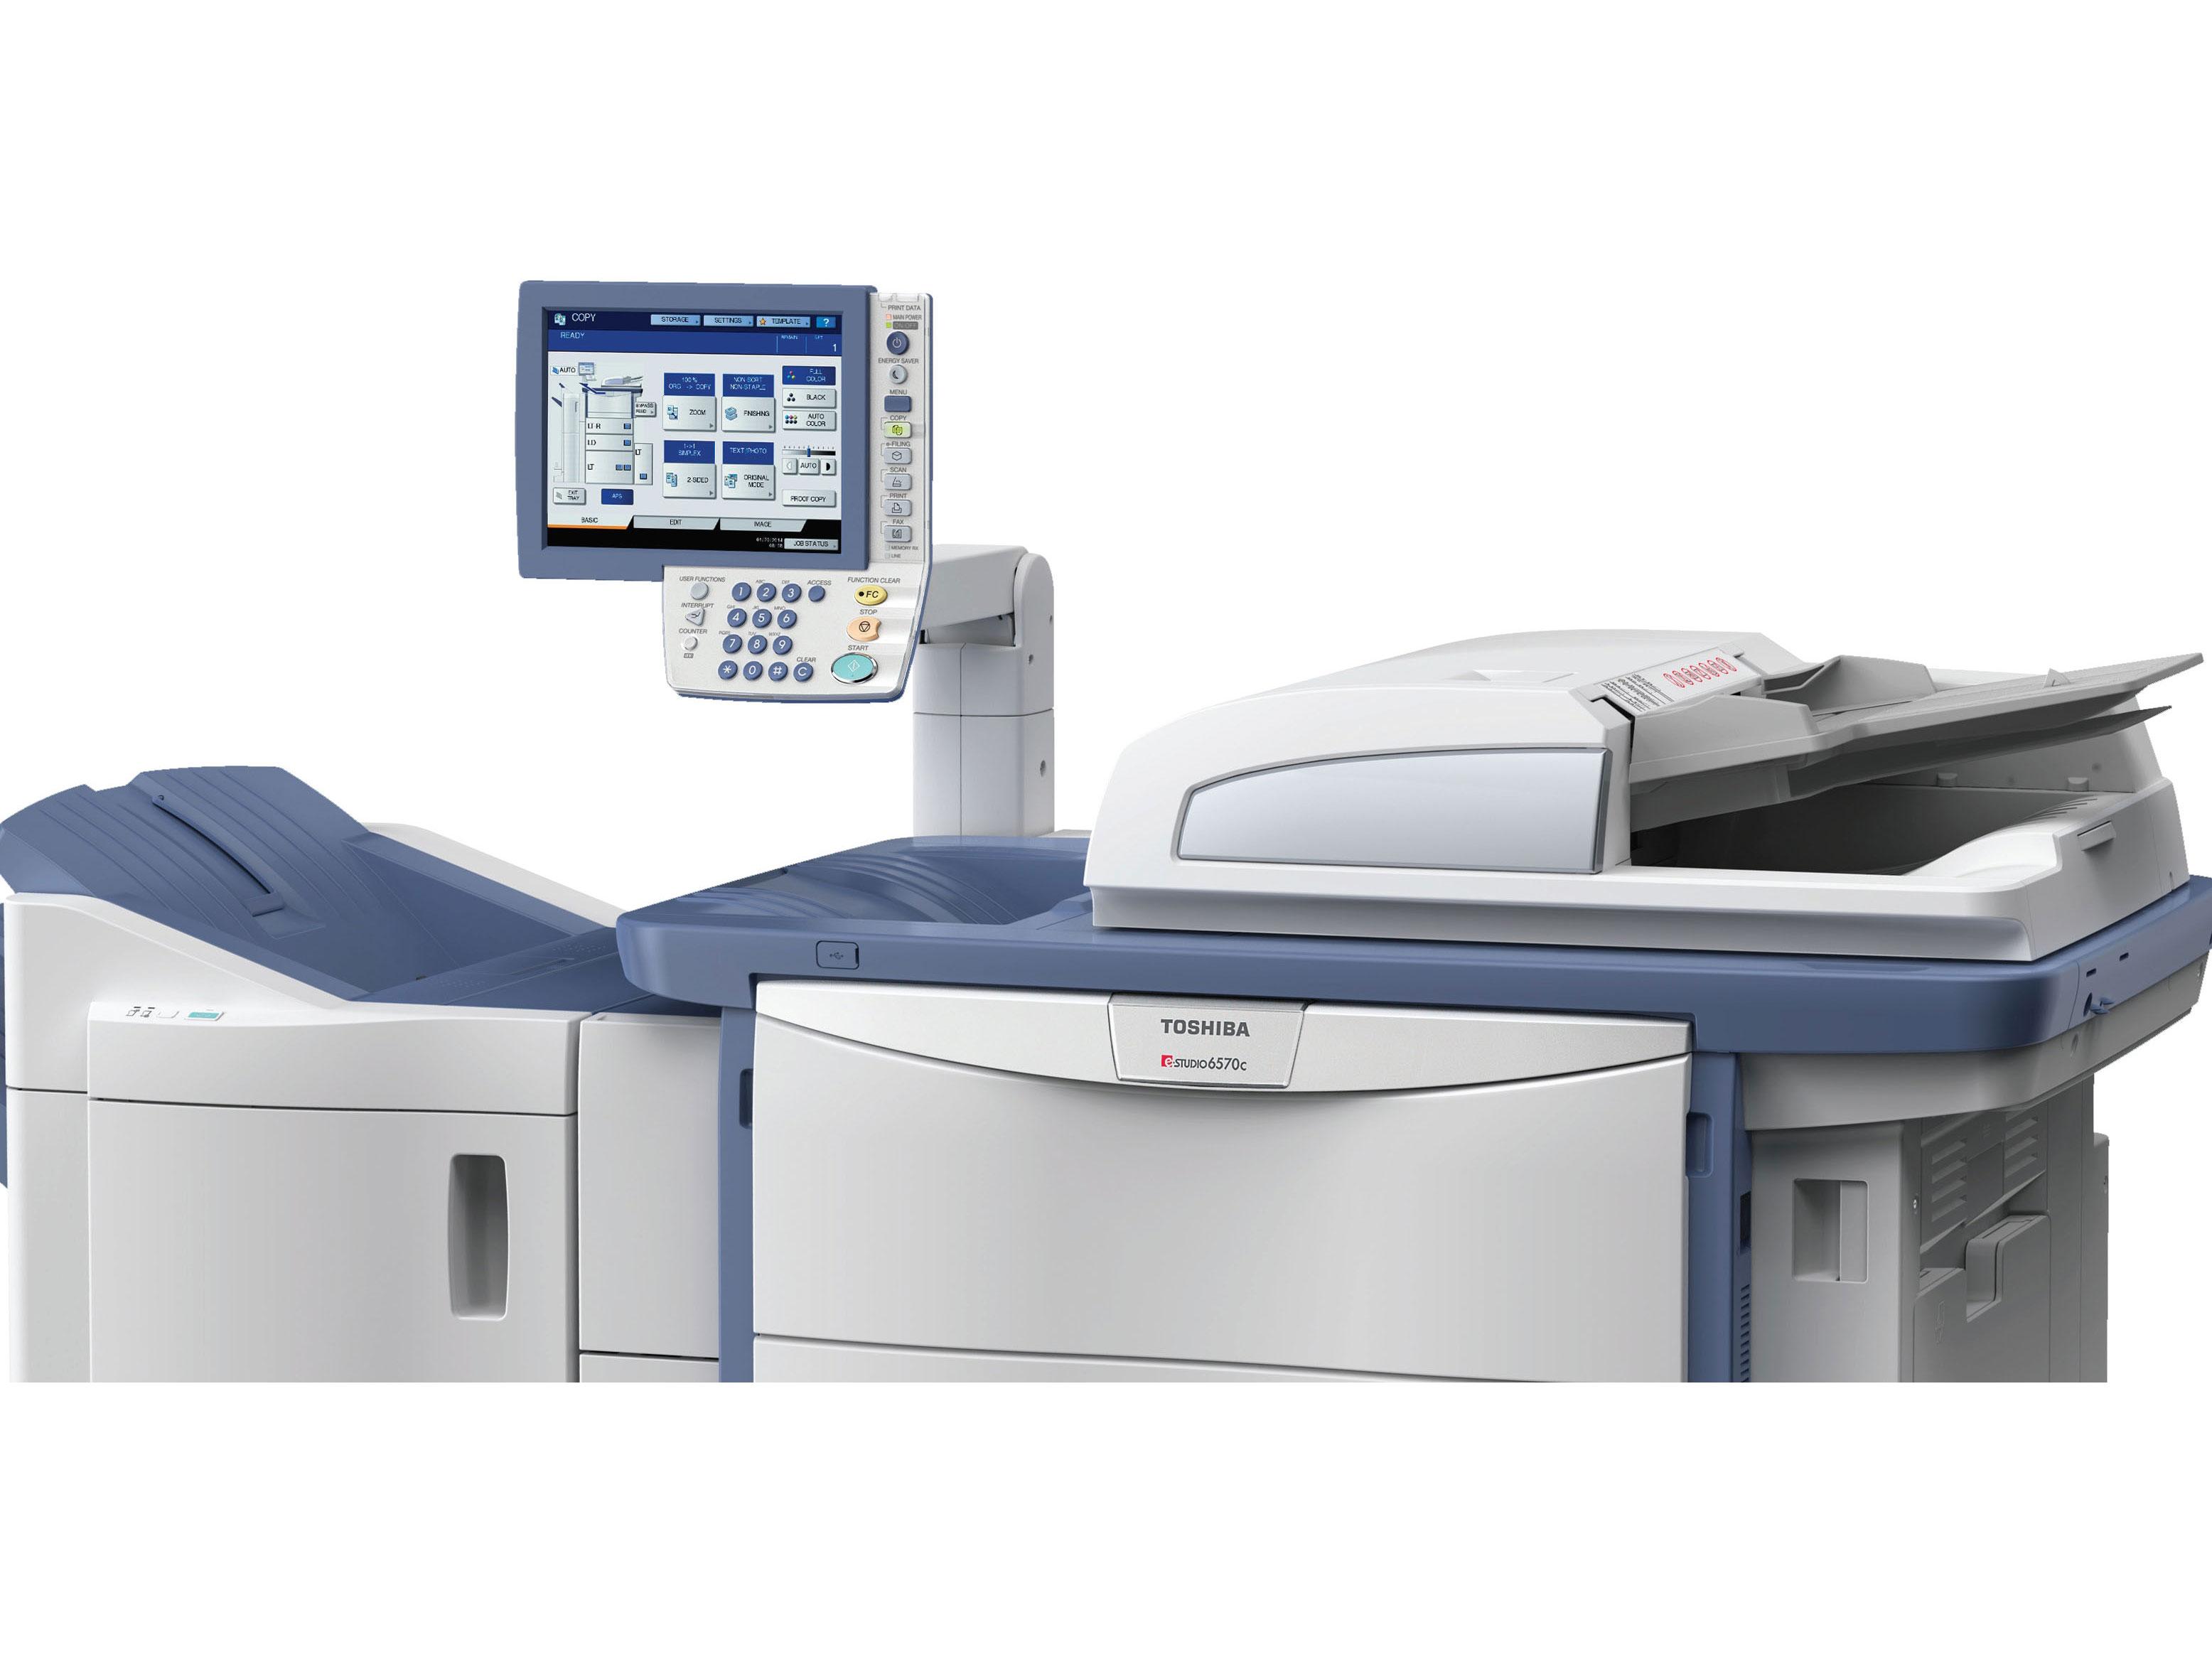 Fotocopiadora Toshiba de Segunda Mano